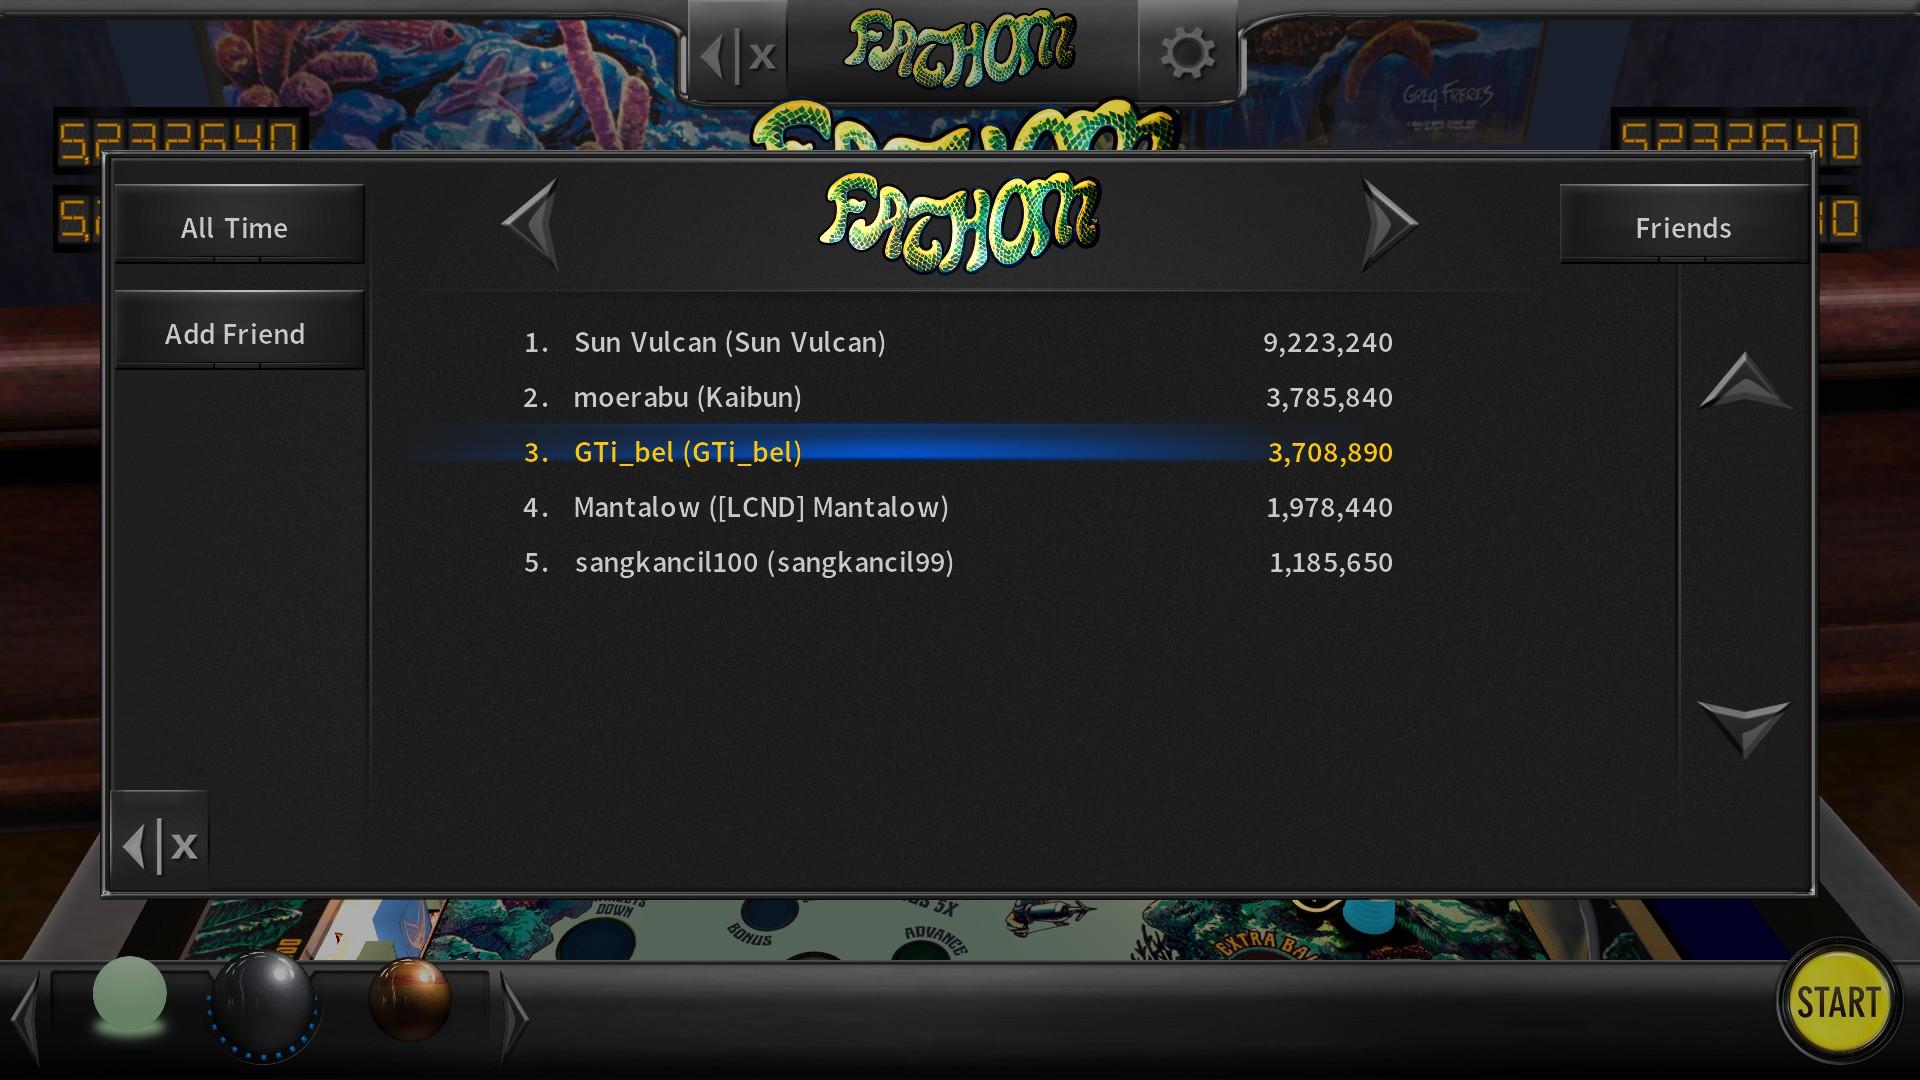 GTibel: Pinball Arcade: Fathom (PC) 3,708,890 points on 2018-01-11 07:48:28